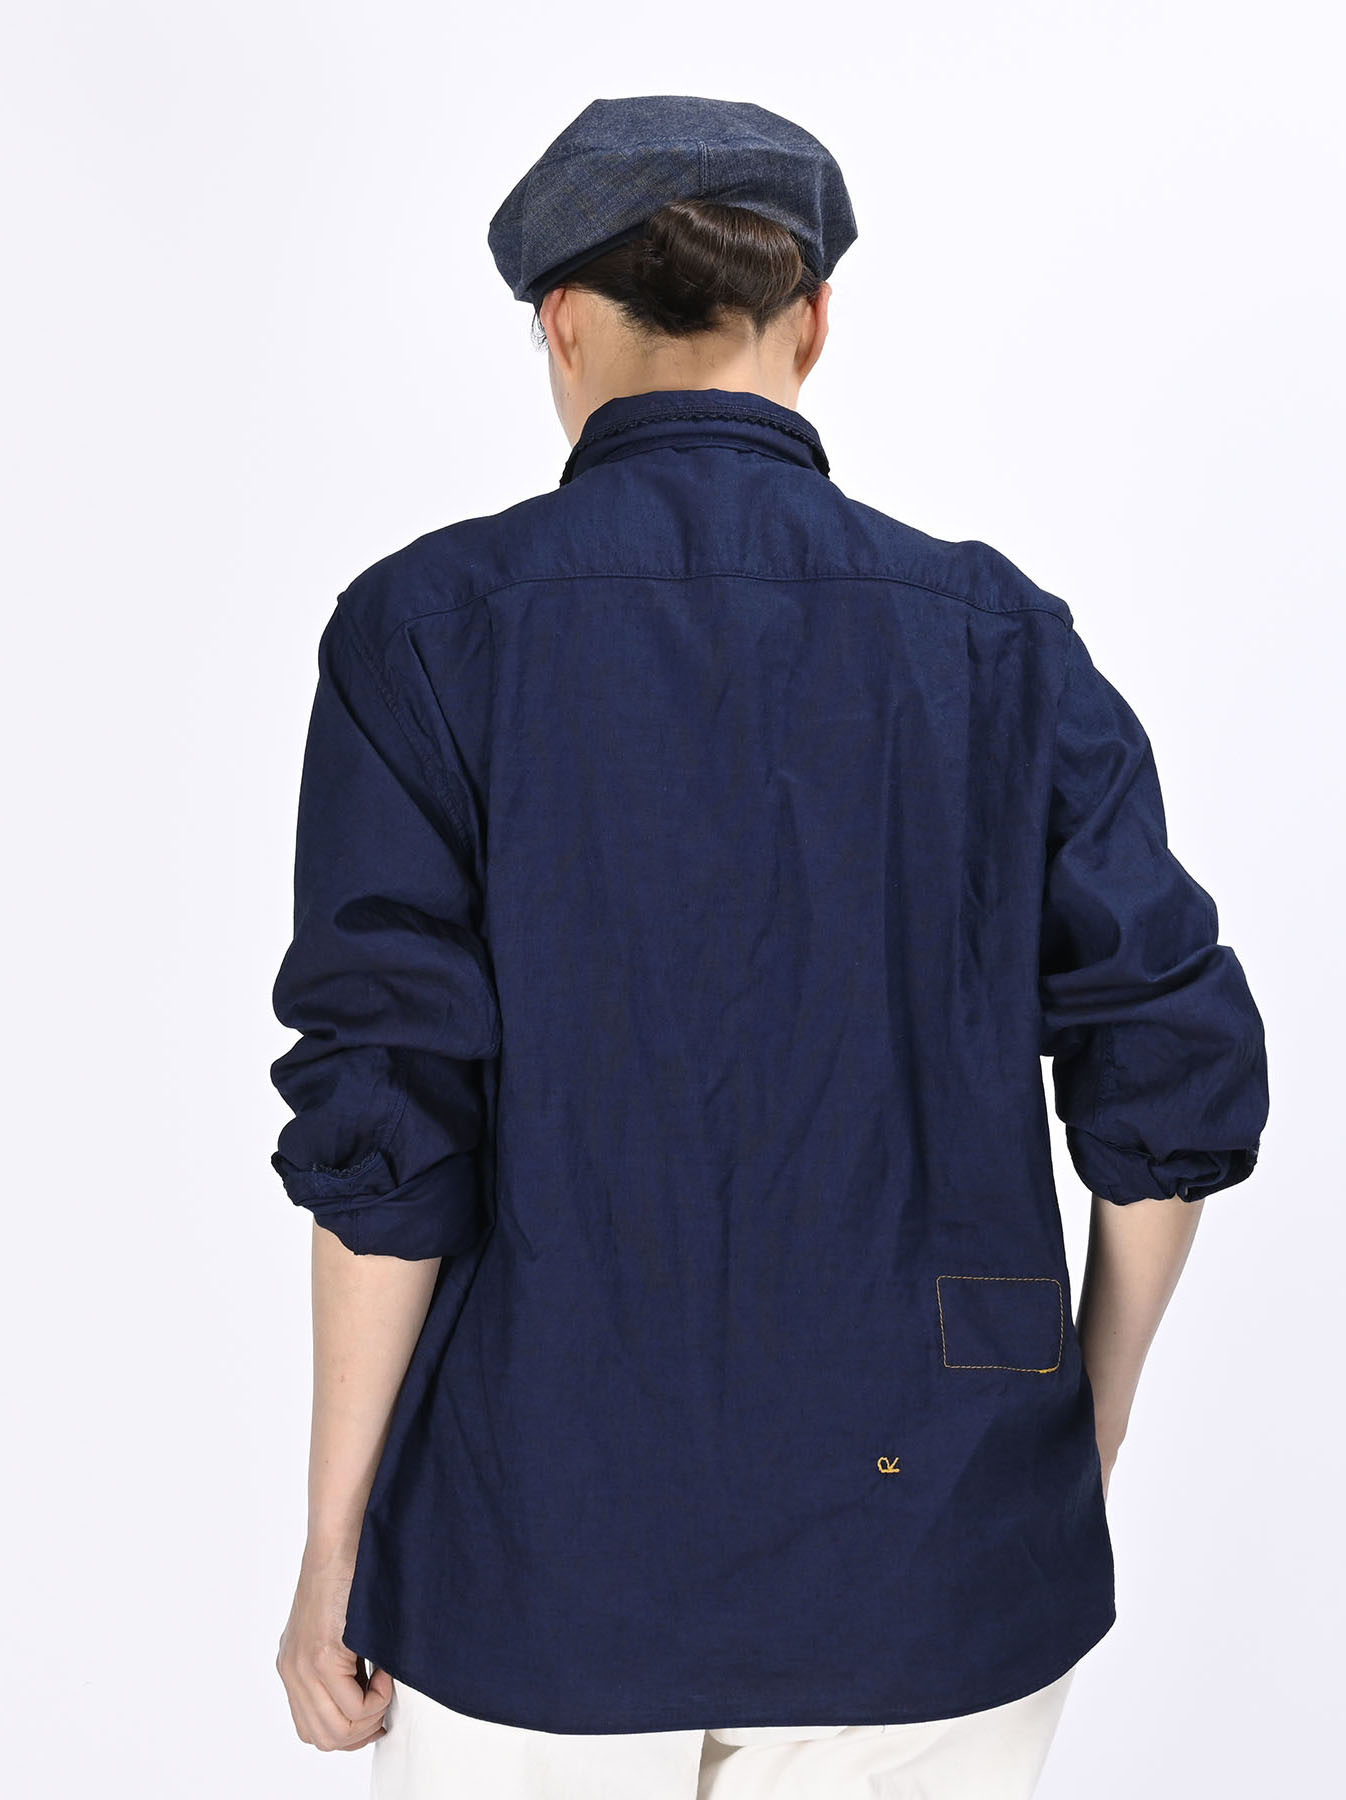 Indigo Thin Oxford 908 Ocean Lace Shirt (0621)-5